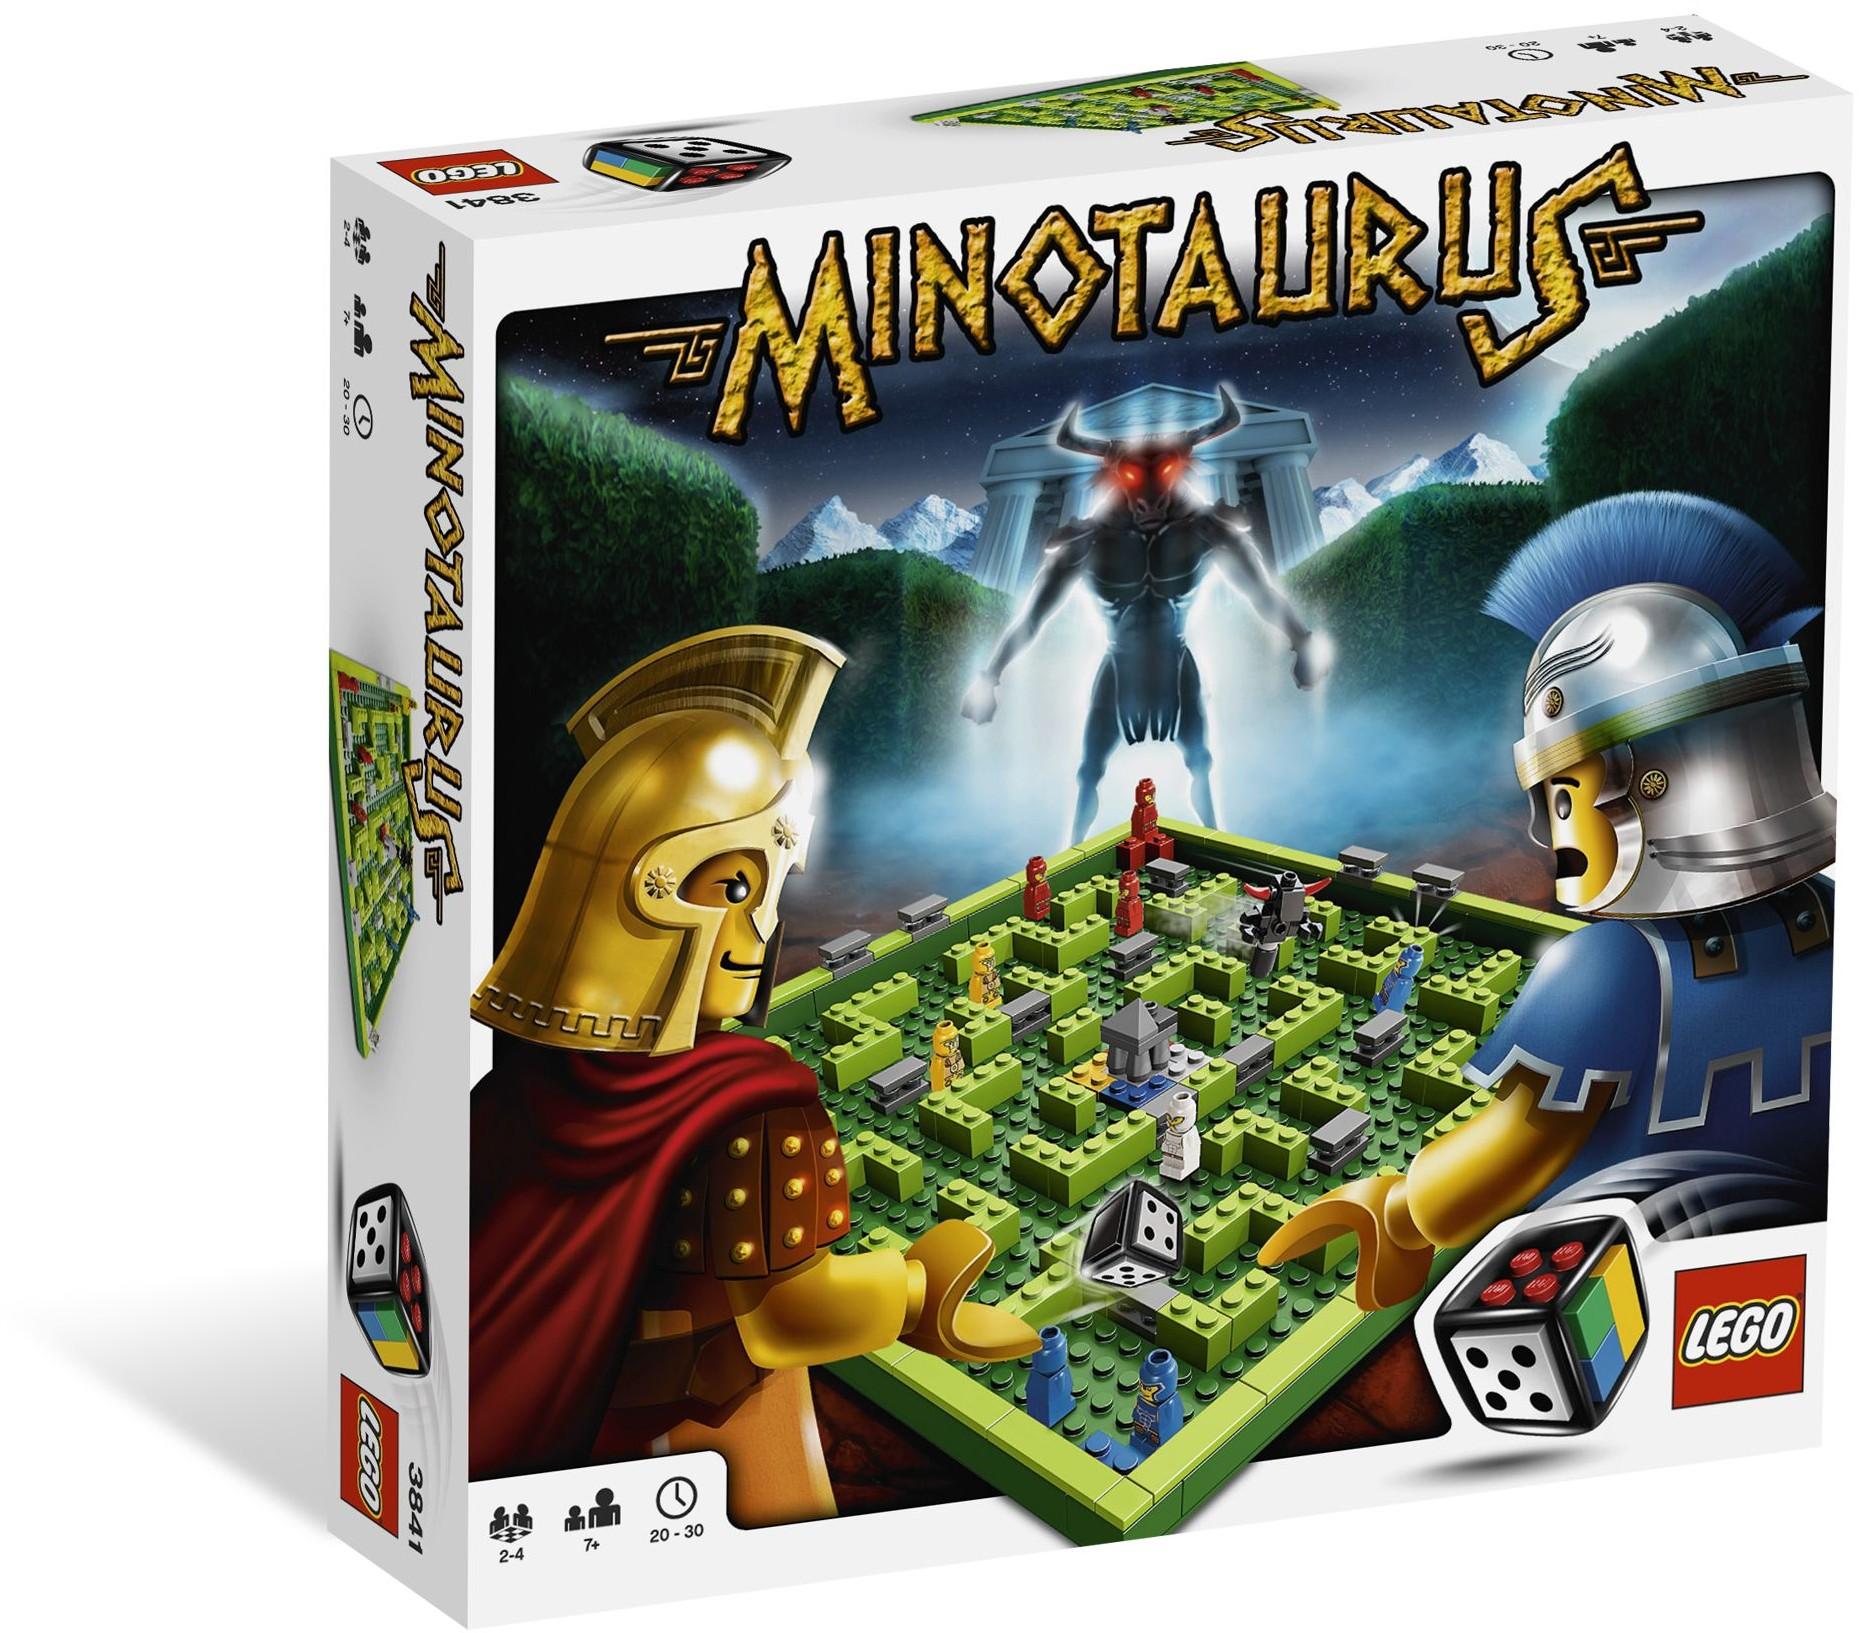 Chess Table 3841 Minotaurus Brickipedia Fandom Powered By Wikia